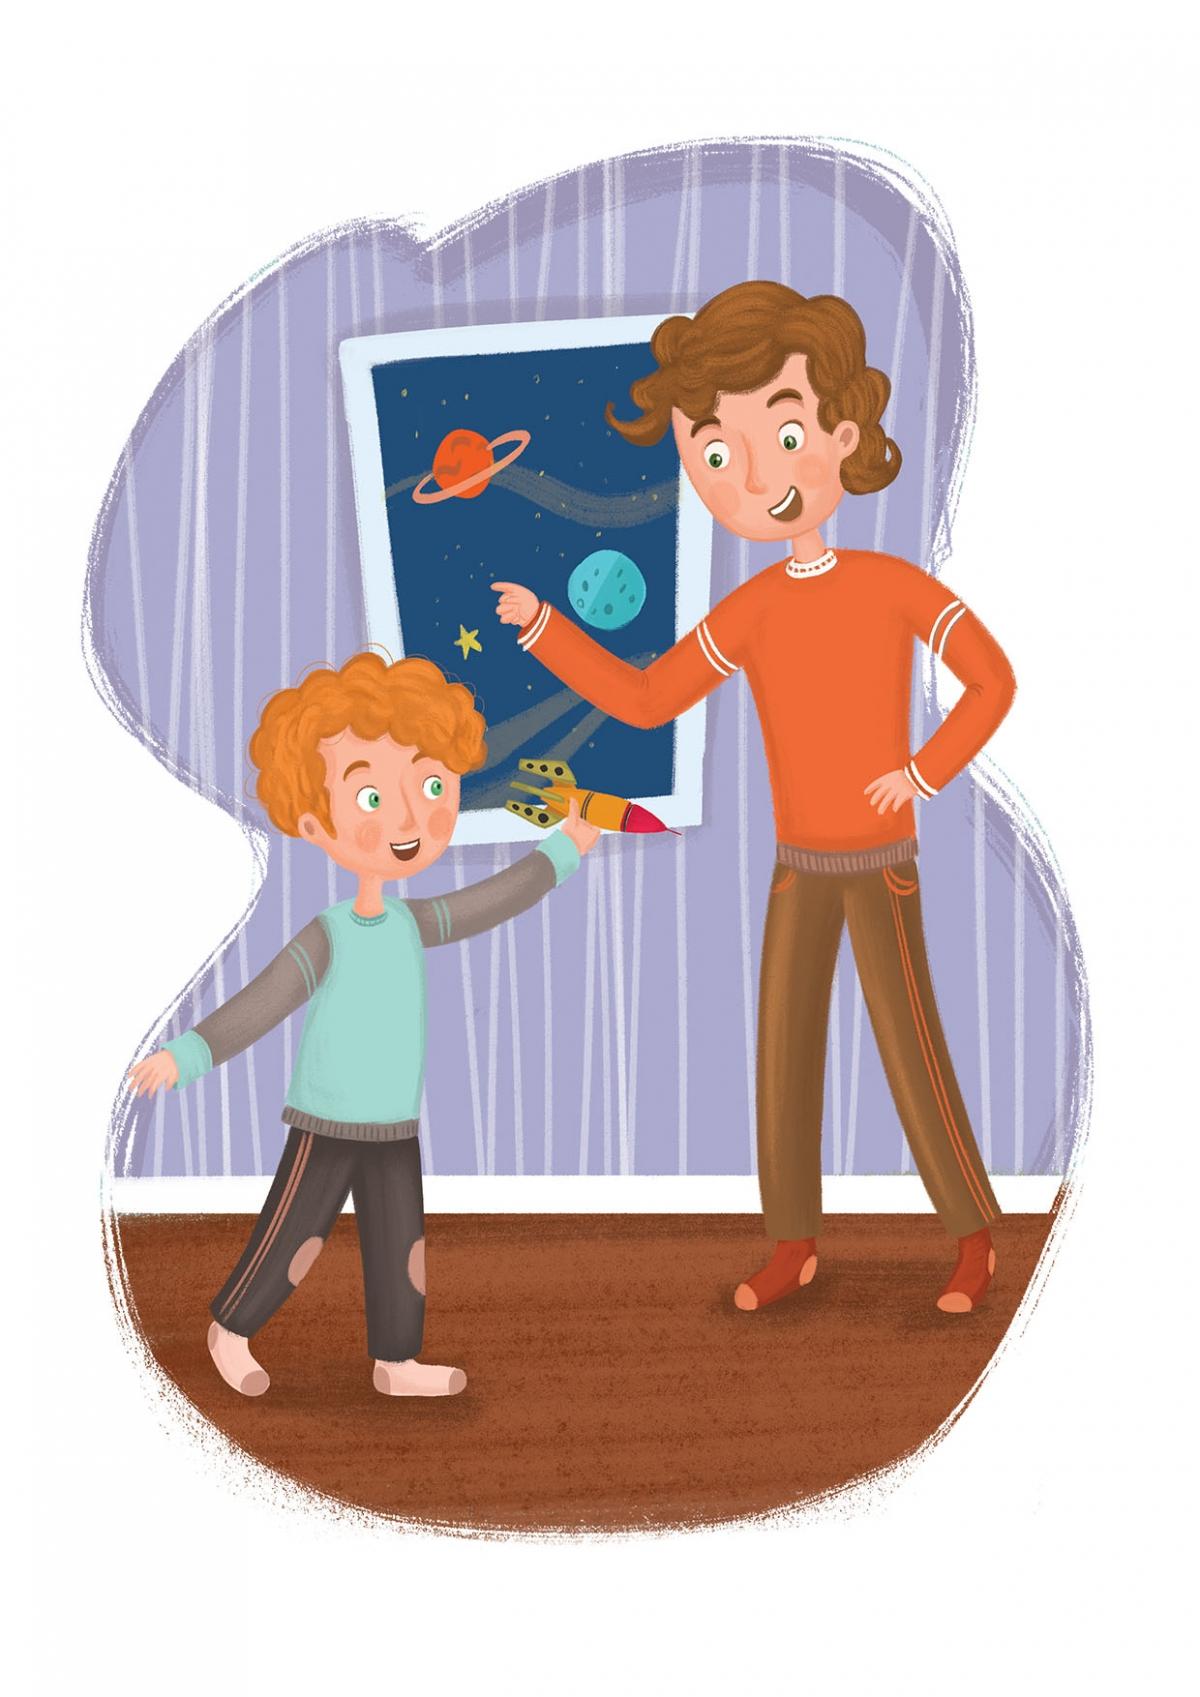 puzzle illustration for children's magazine